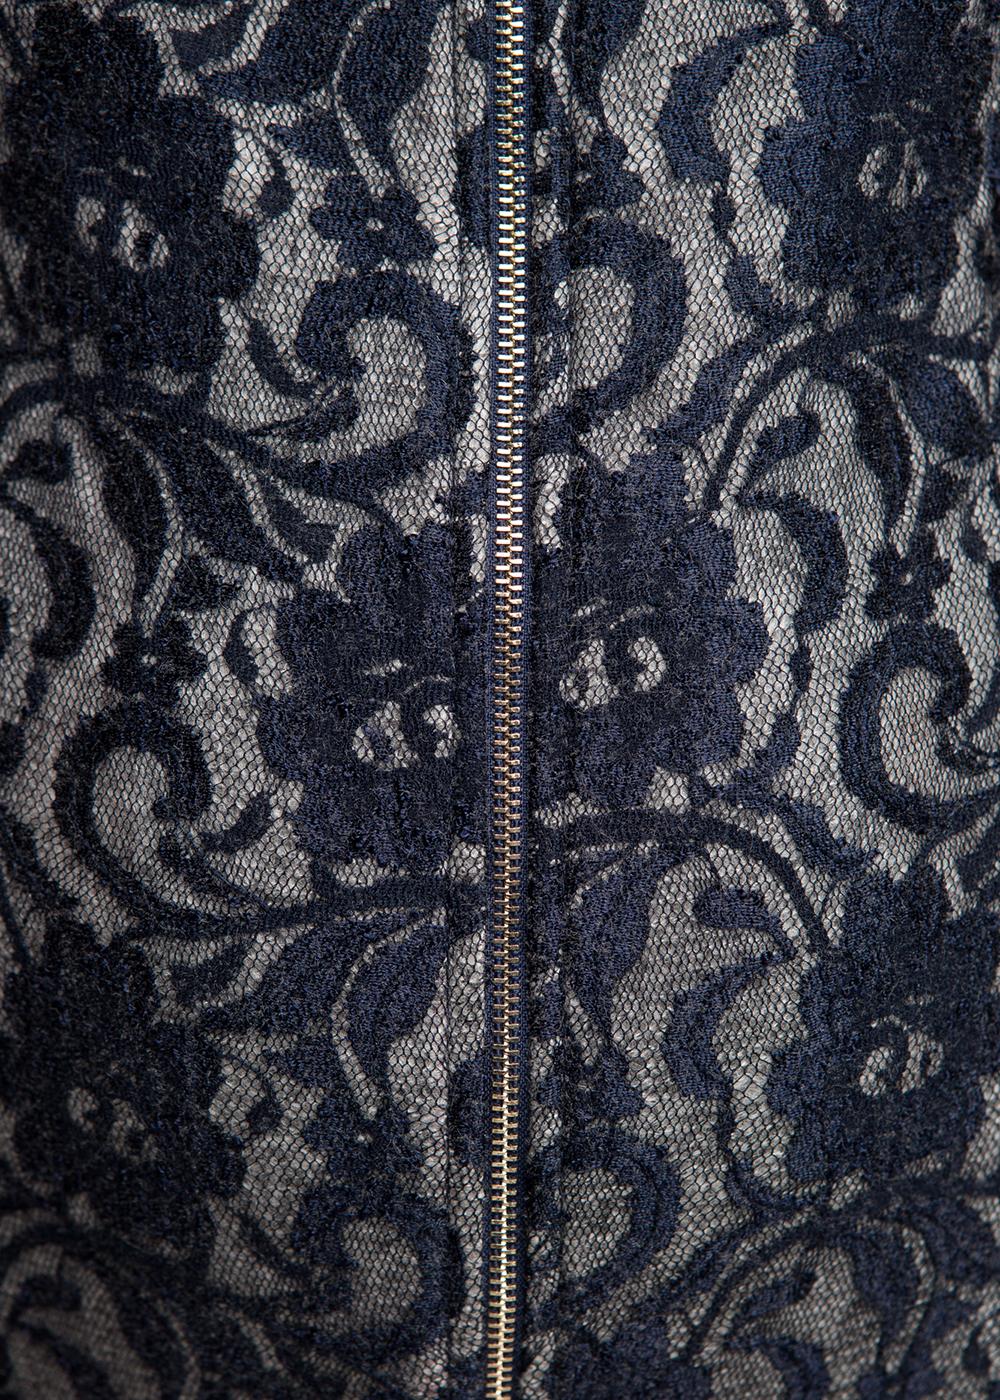 teplyj-kostyum-azzurro-2